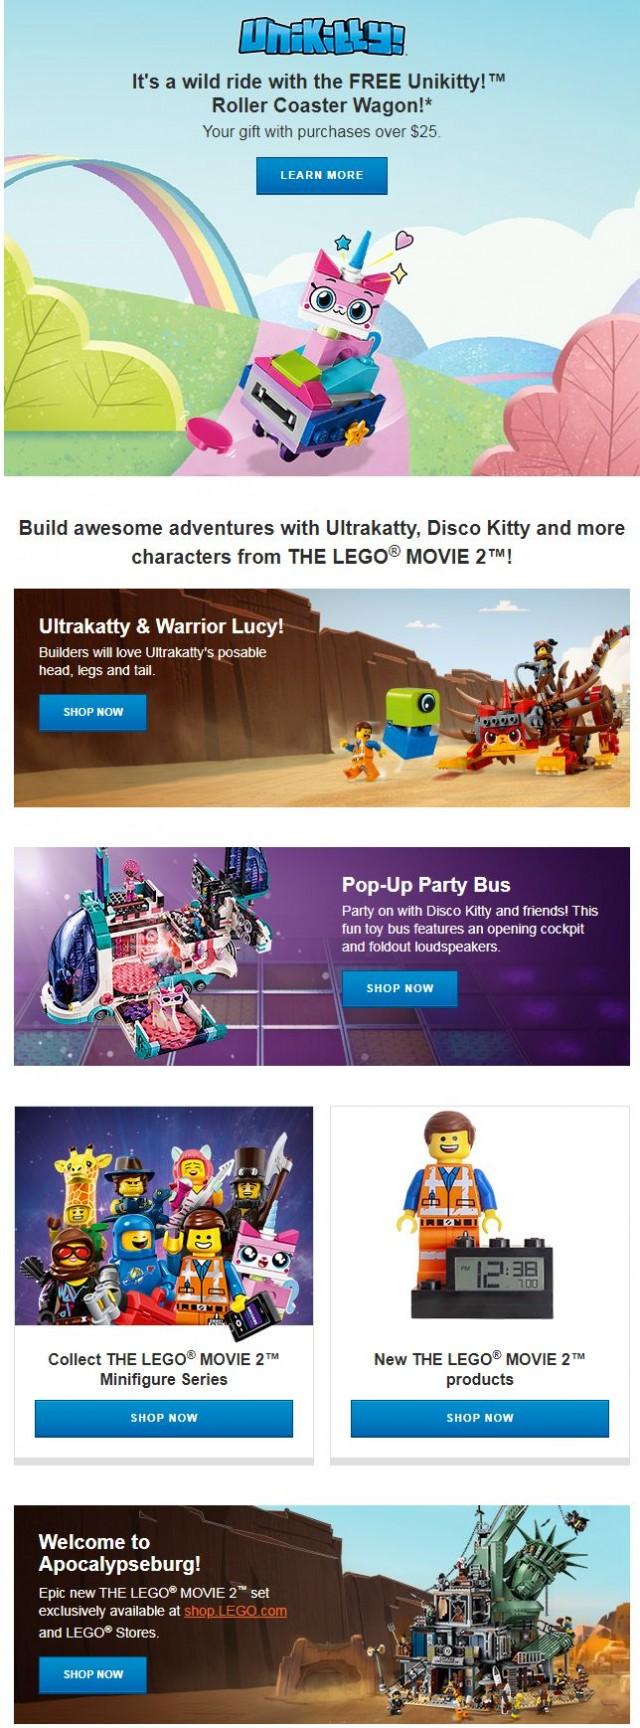 Coupon for: Lego - FREE Unikitty™ Roller Coaster Wagon!*